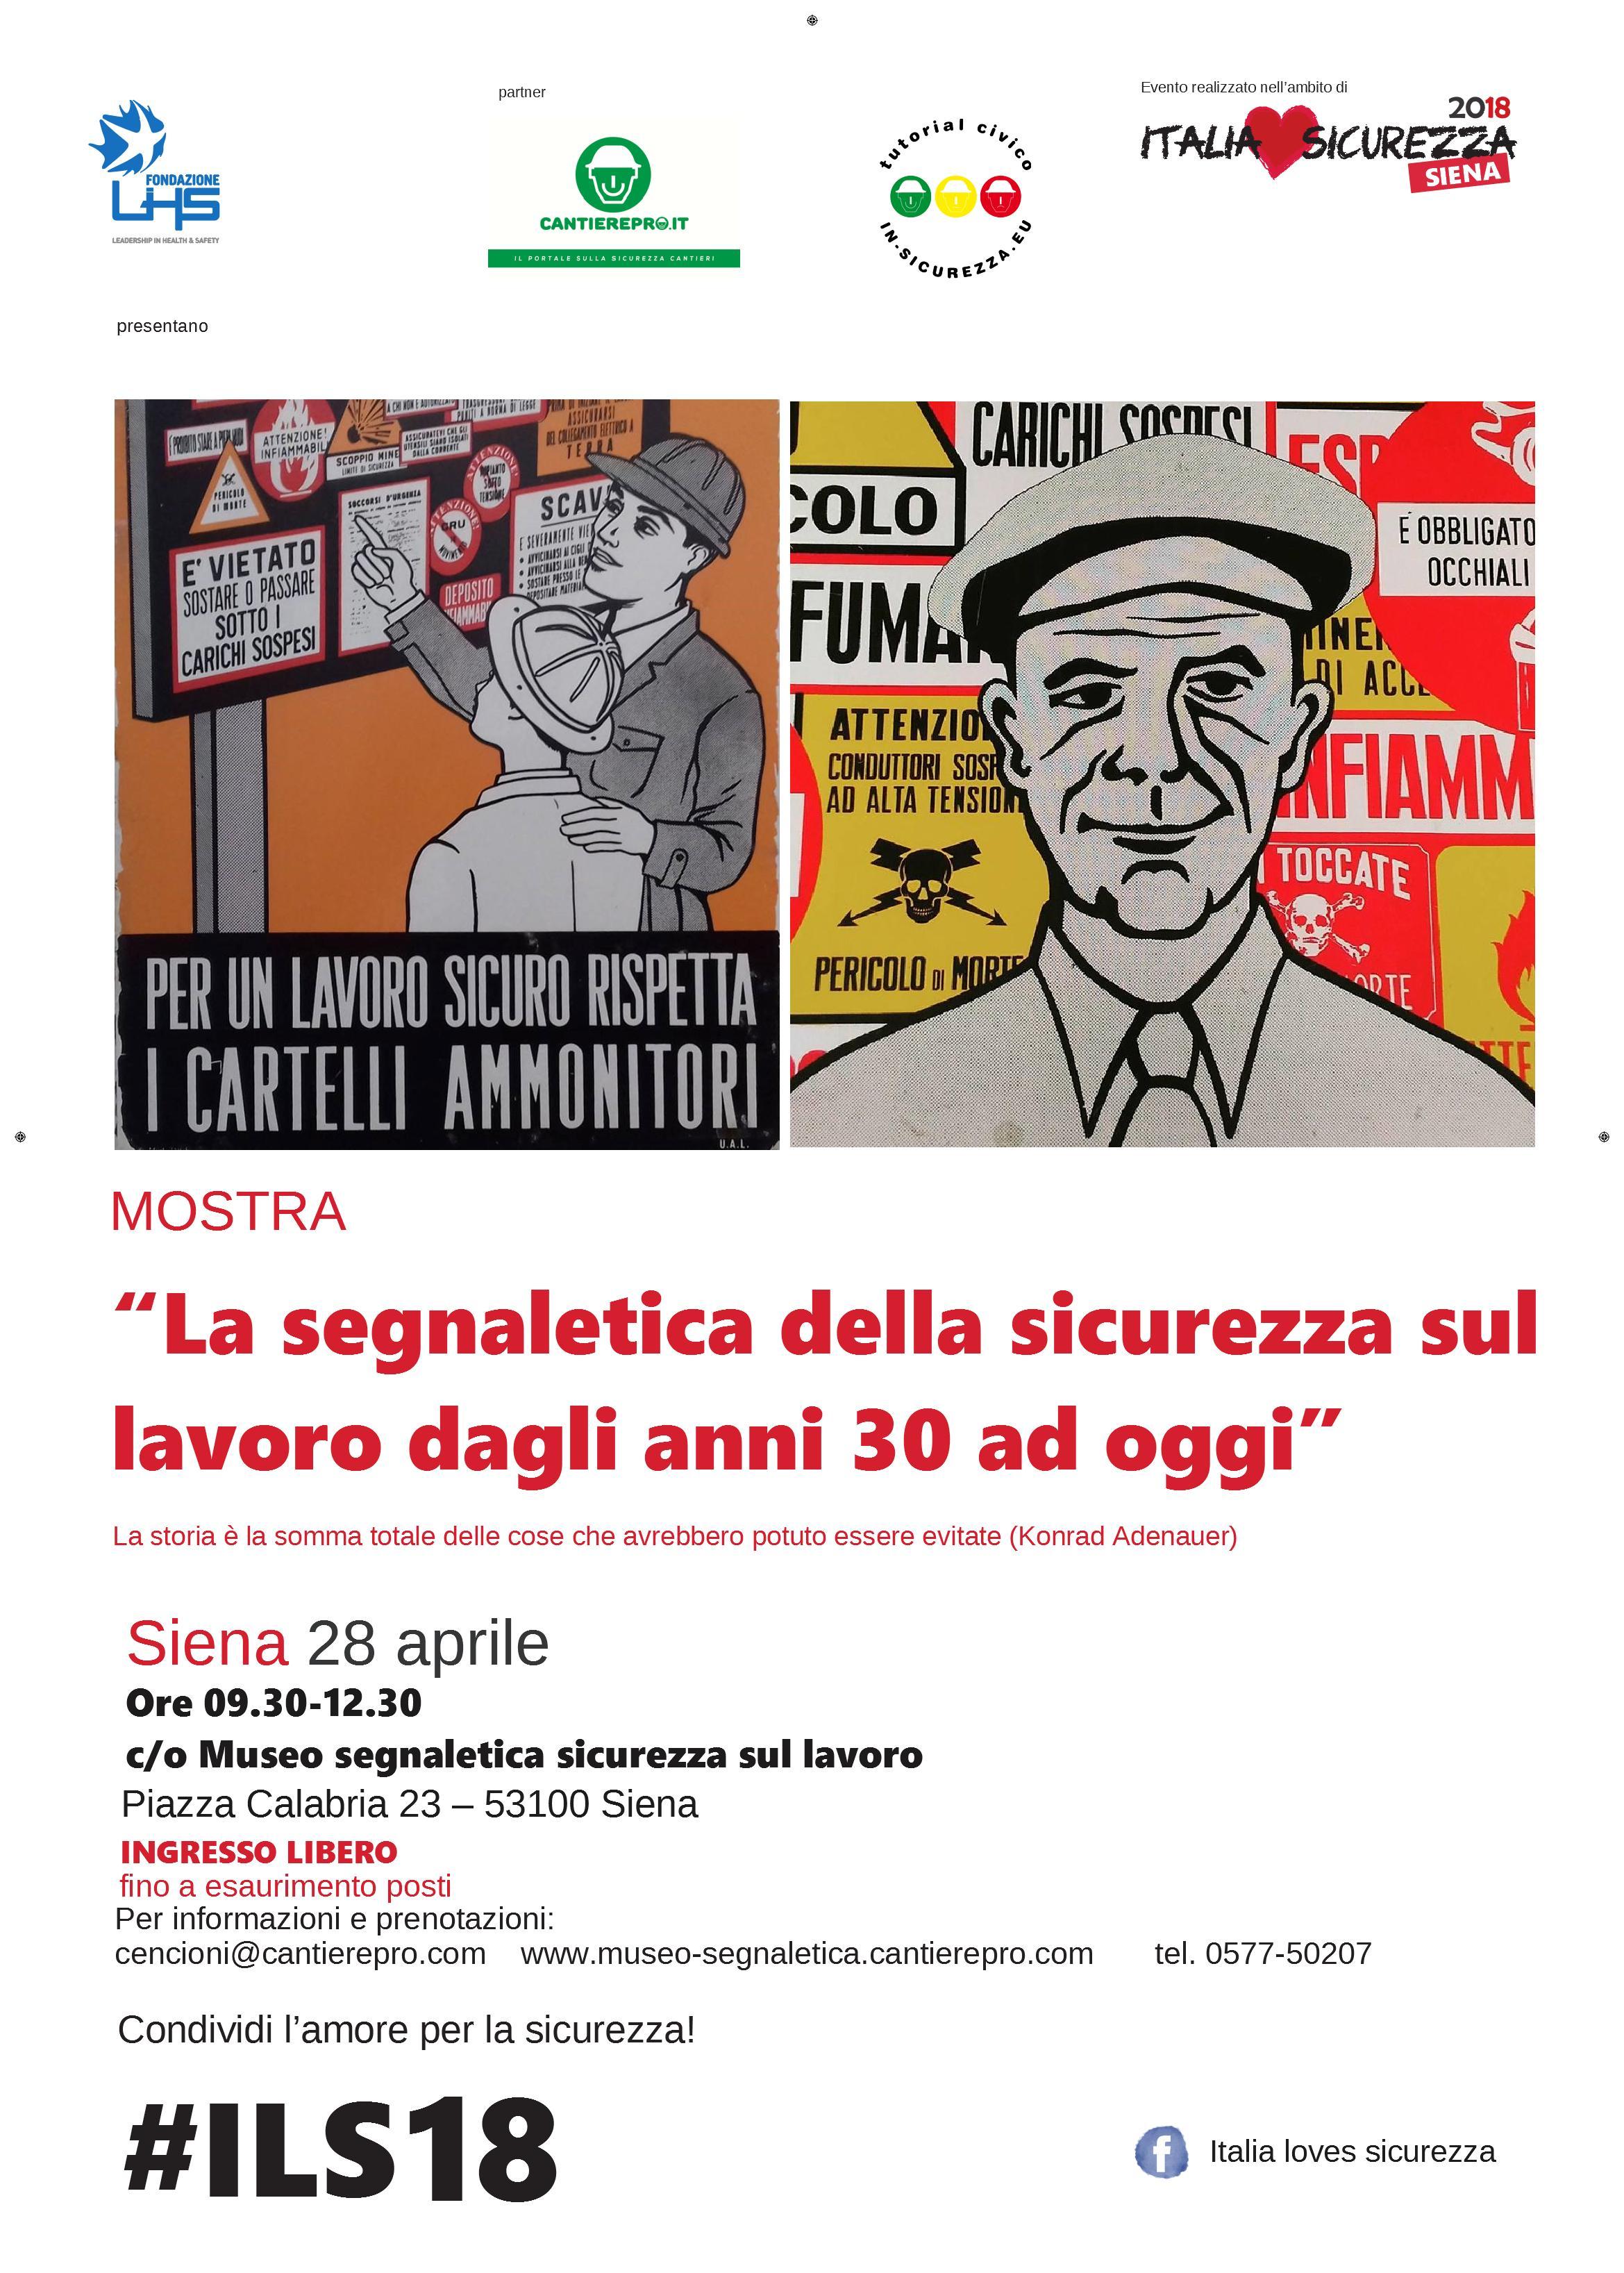 http://www.fondlhs.org/wp-content/uploads/2018/03/ILS18_Poster-apertura.jpg